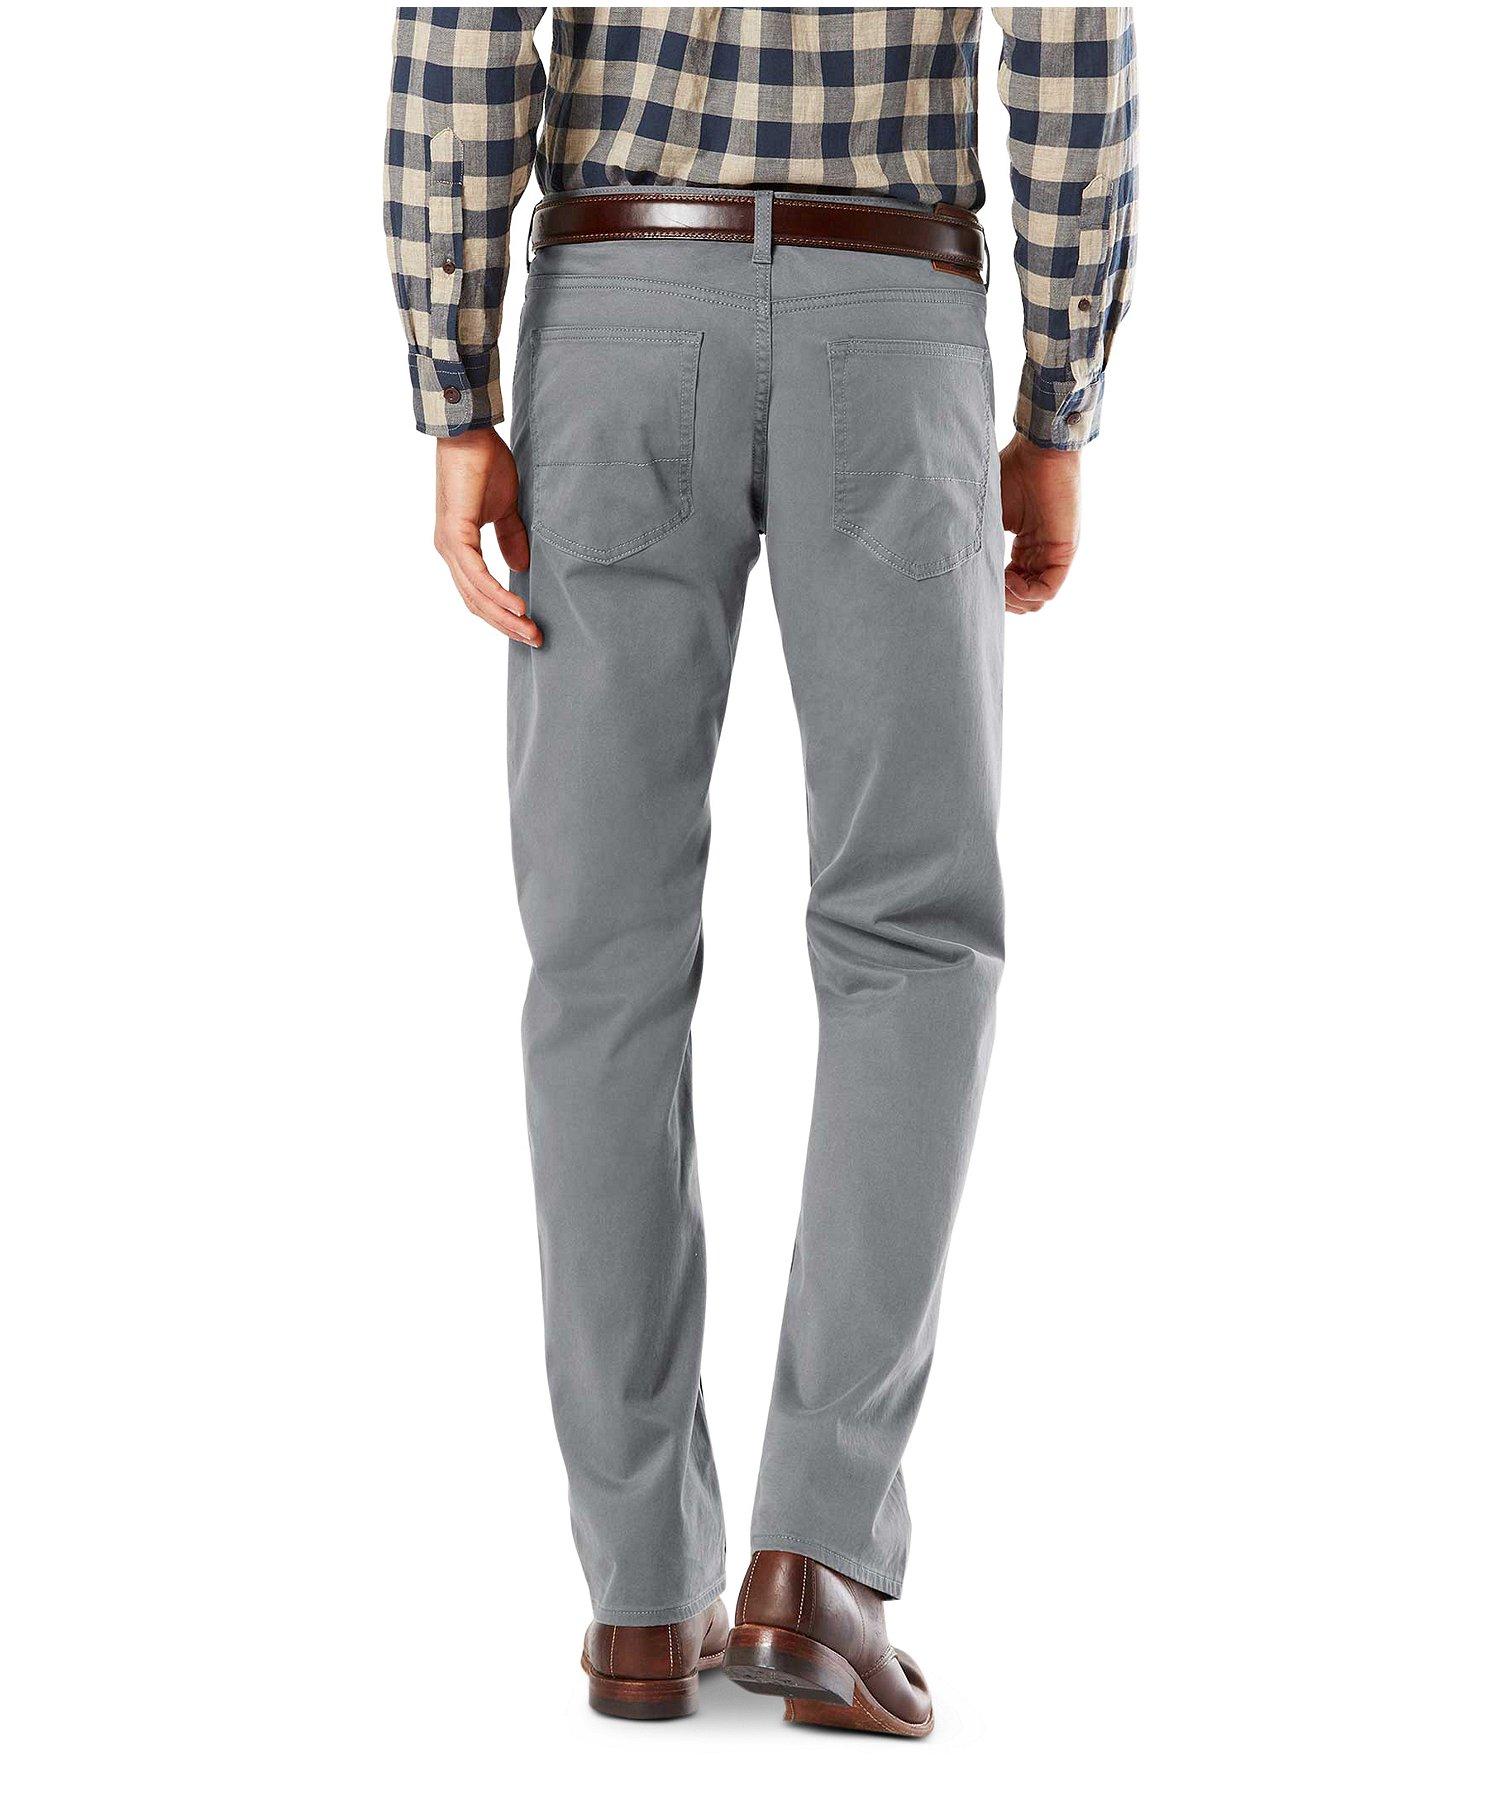 Essentials Mens Athletic-fit 5-Pocket Stretch Twill Pant